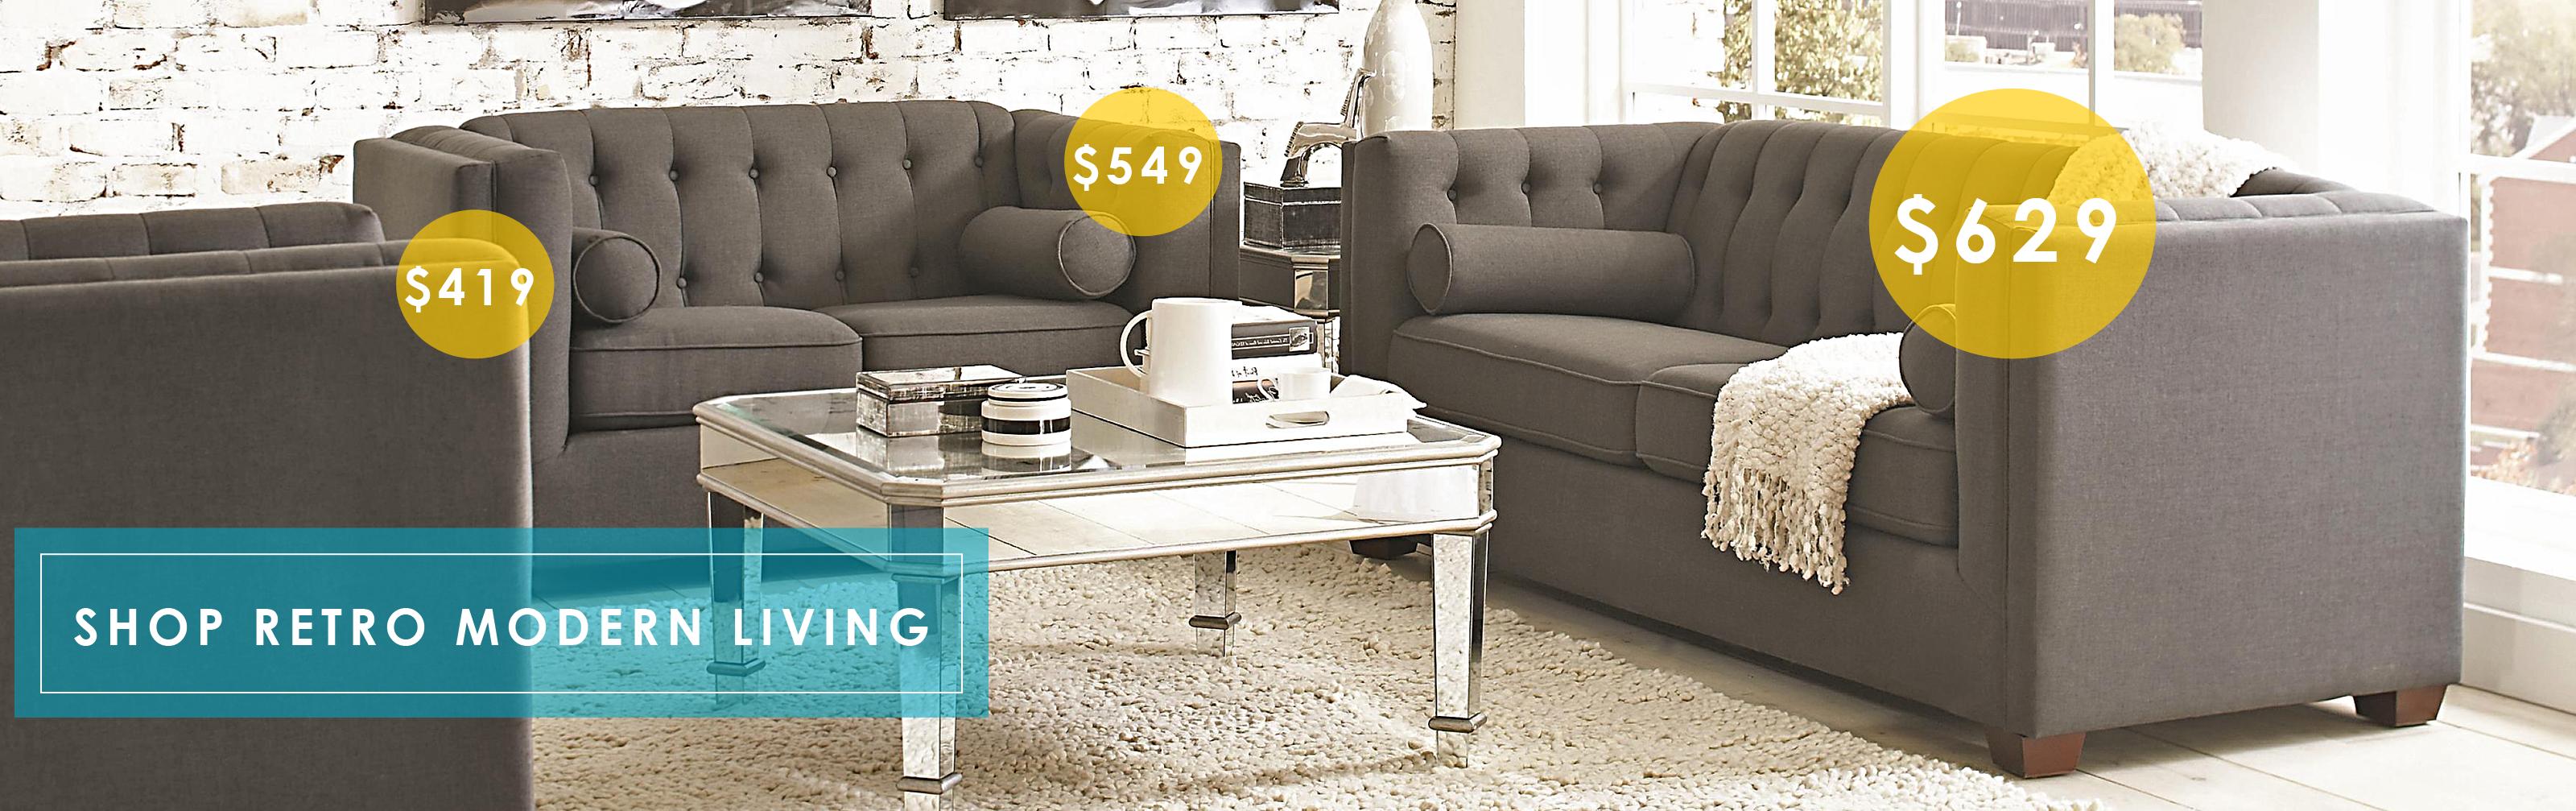 Shop Retro Modern Living Room Furniture